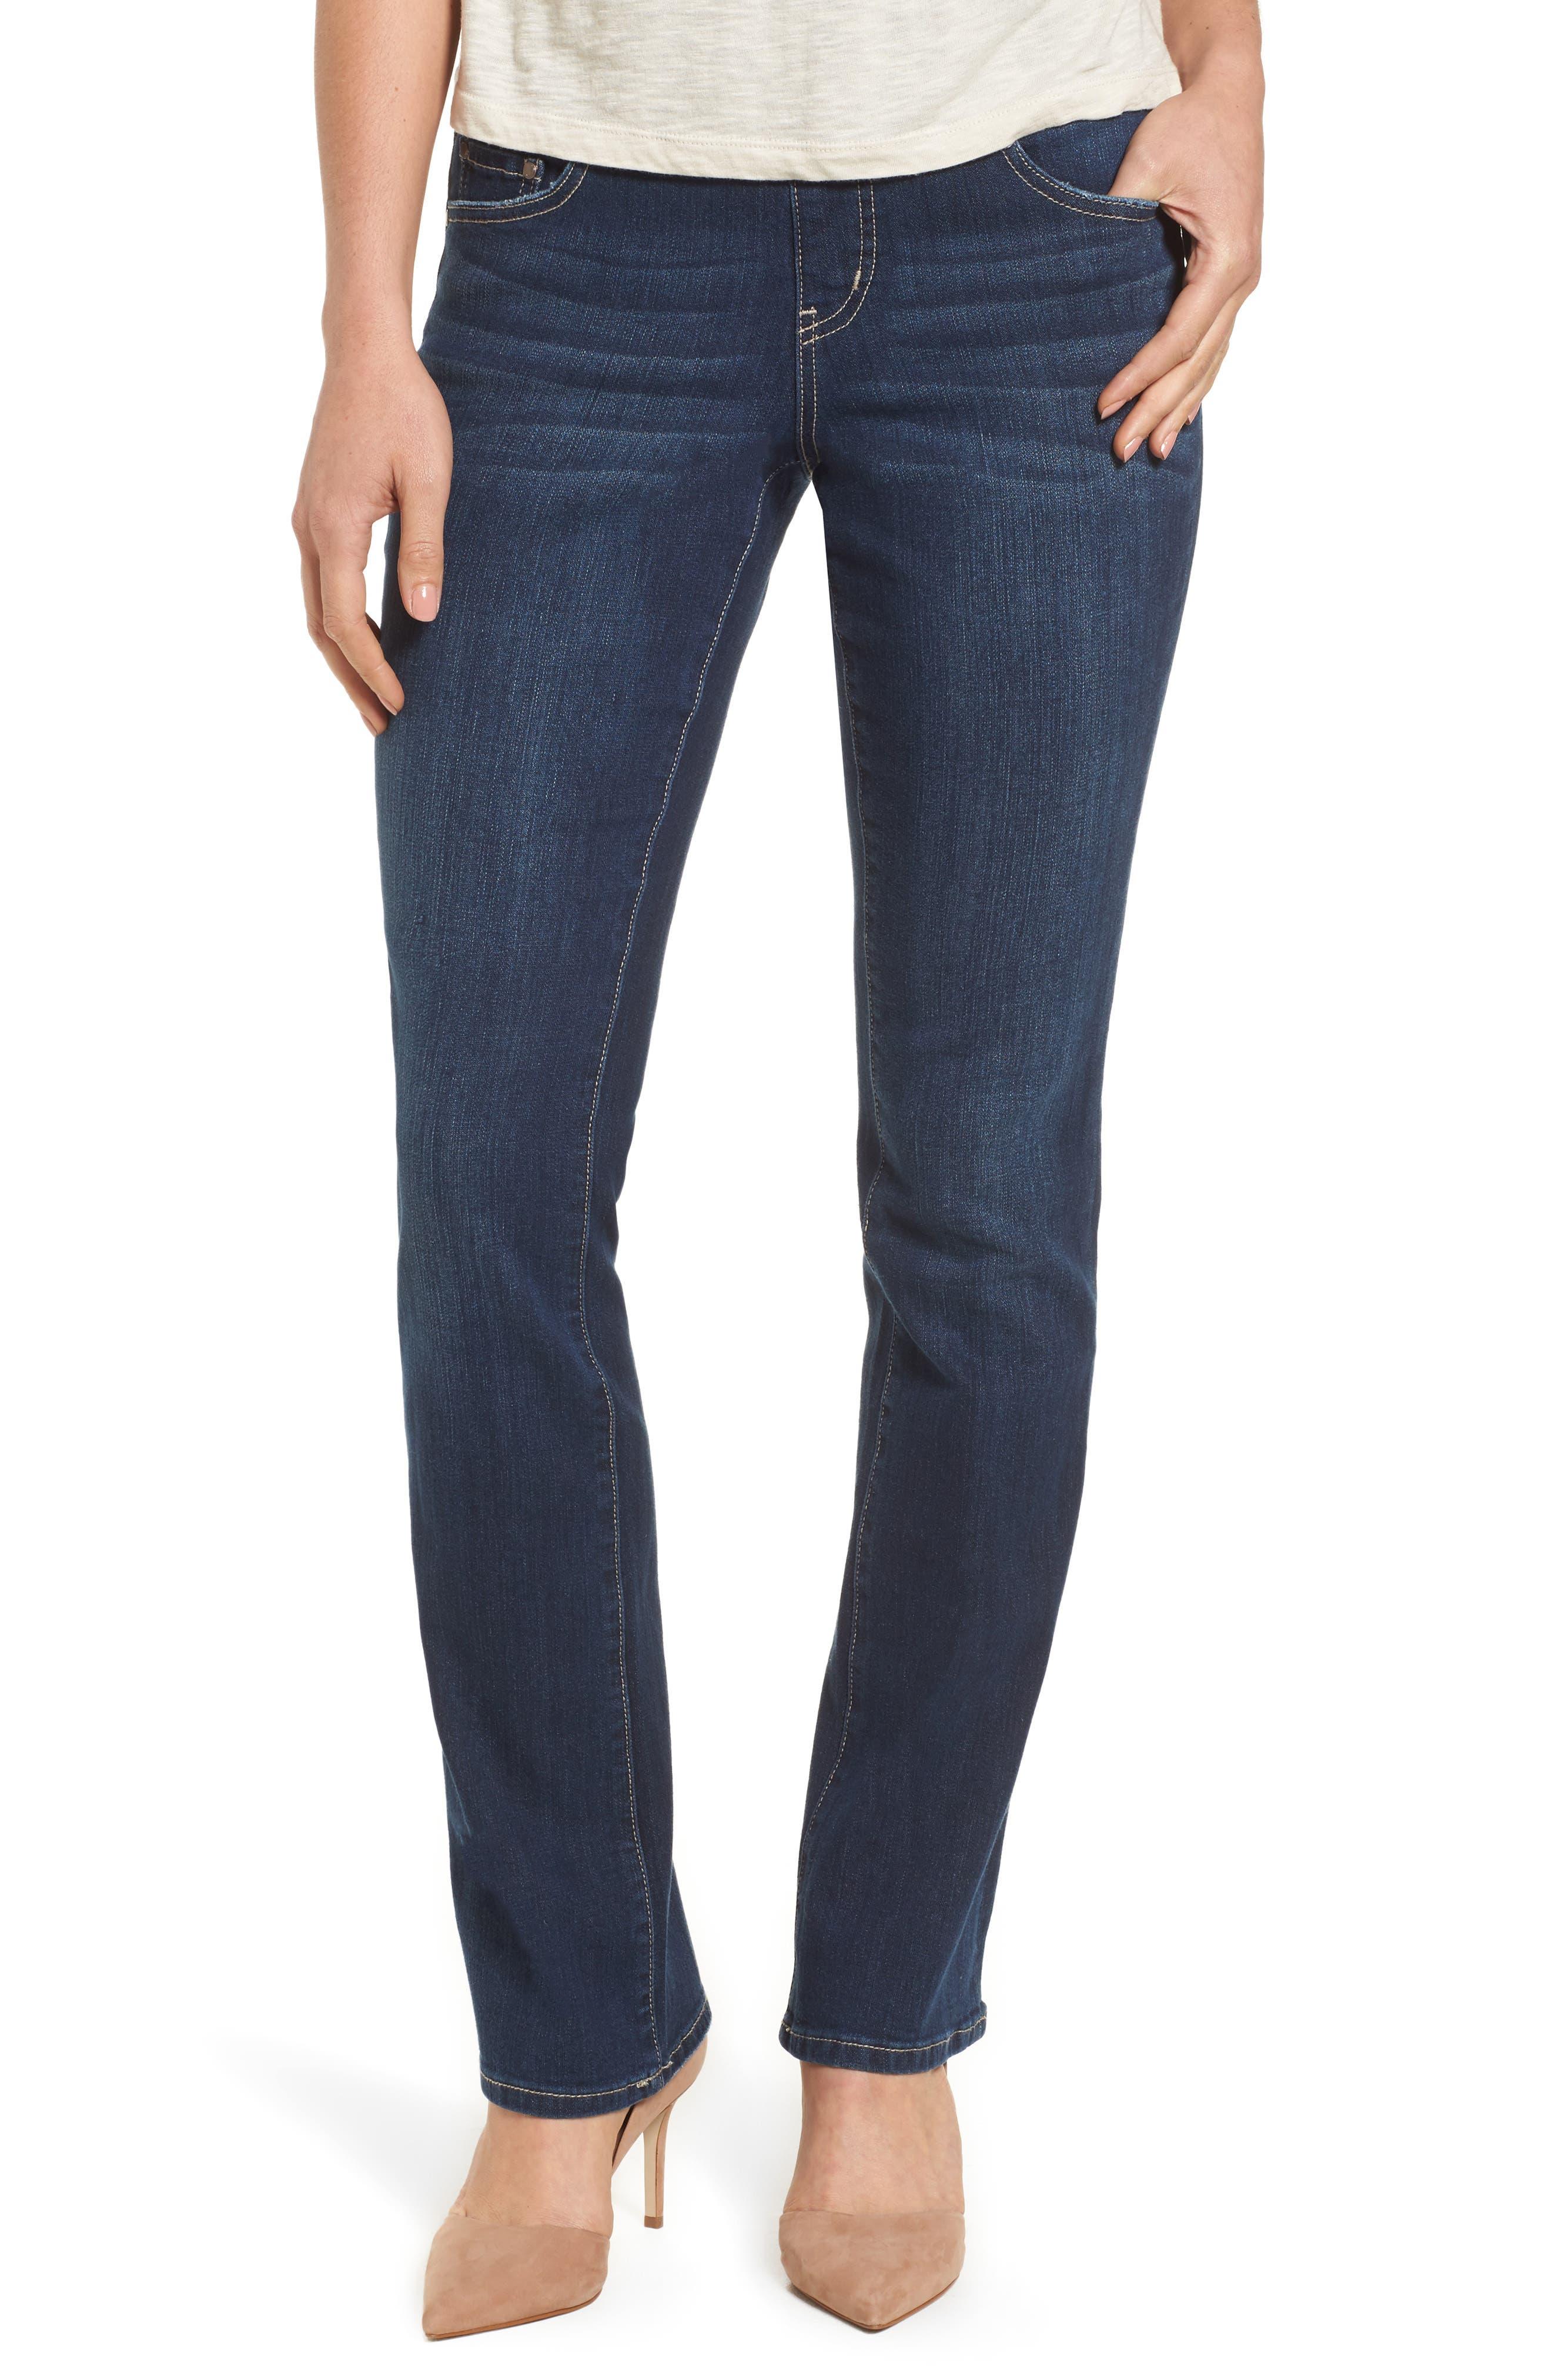 Paley Stretch Bootcut Jeans,                             Main thumbnail 1, color,                             Dark Indigo